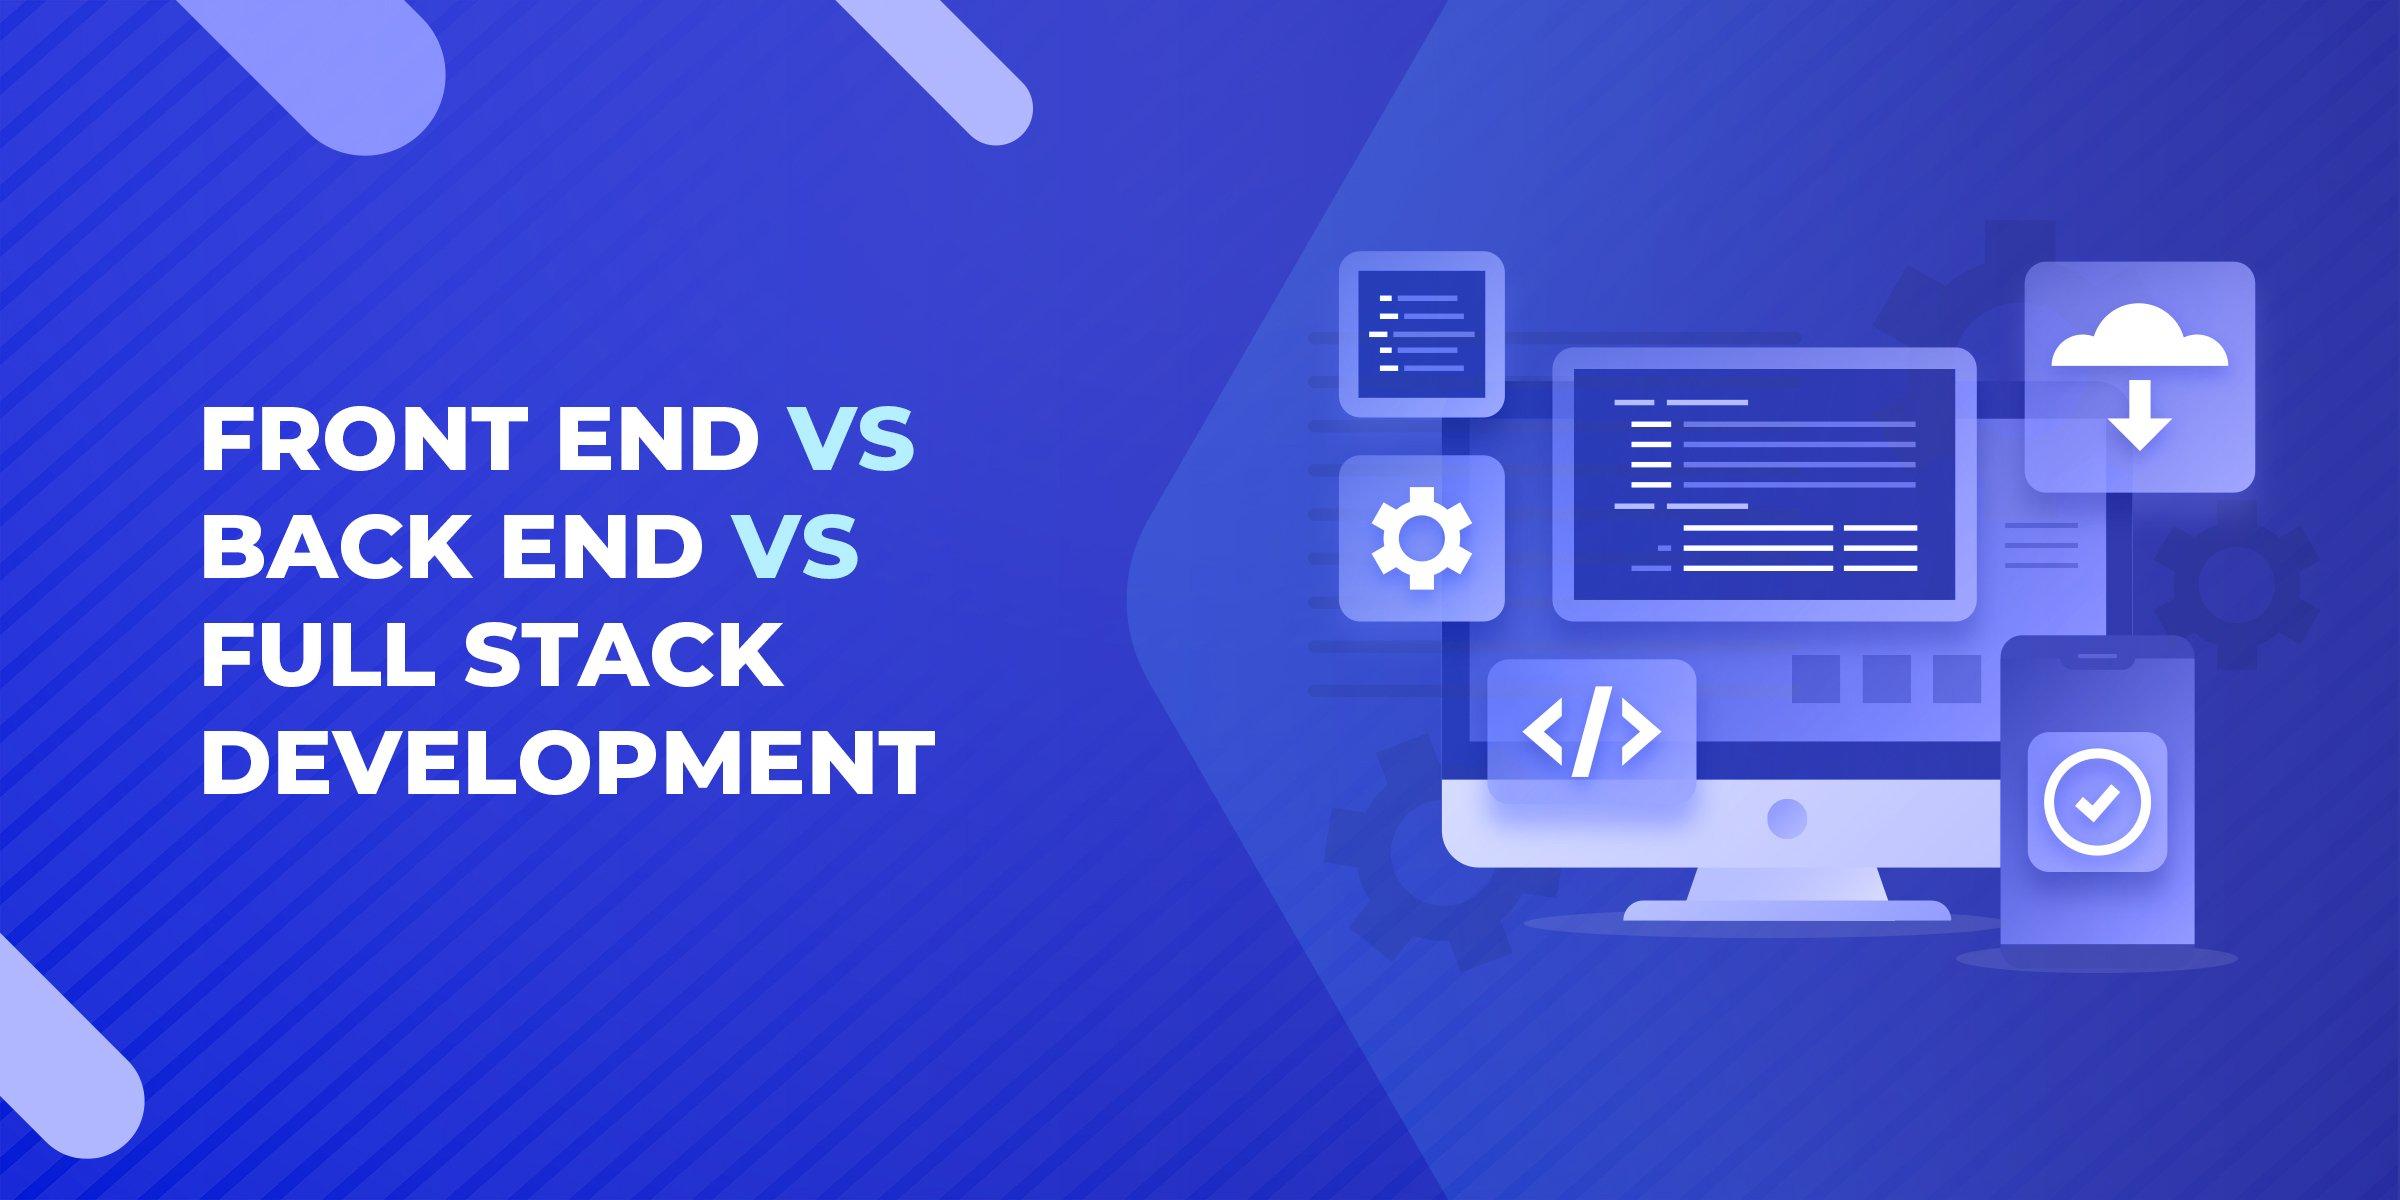 Front End vs Back End vs Full Stack Development